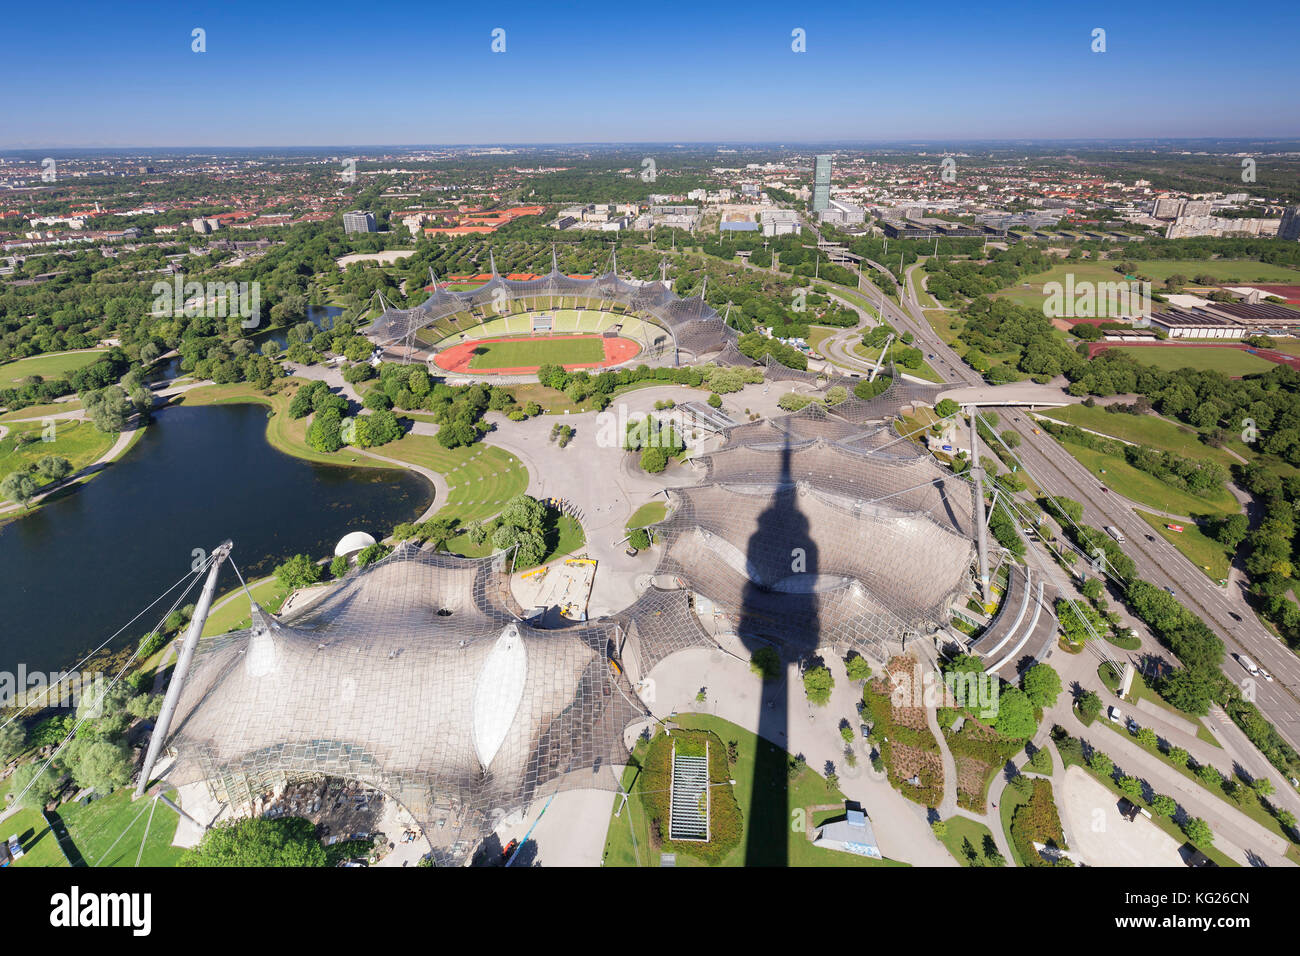 Blick vom Olympiaturm olympiaturm () am Olympiastadion im Olympic Park, München, Bayern, Deutschland, Europa Stockbild